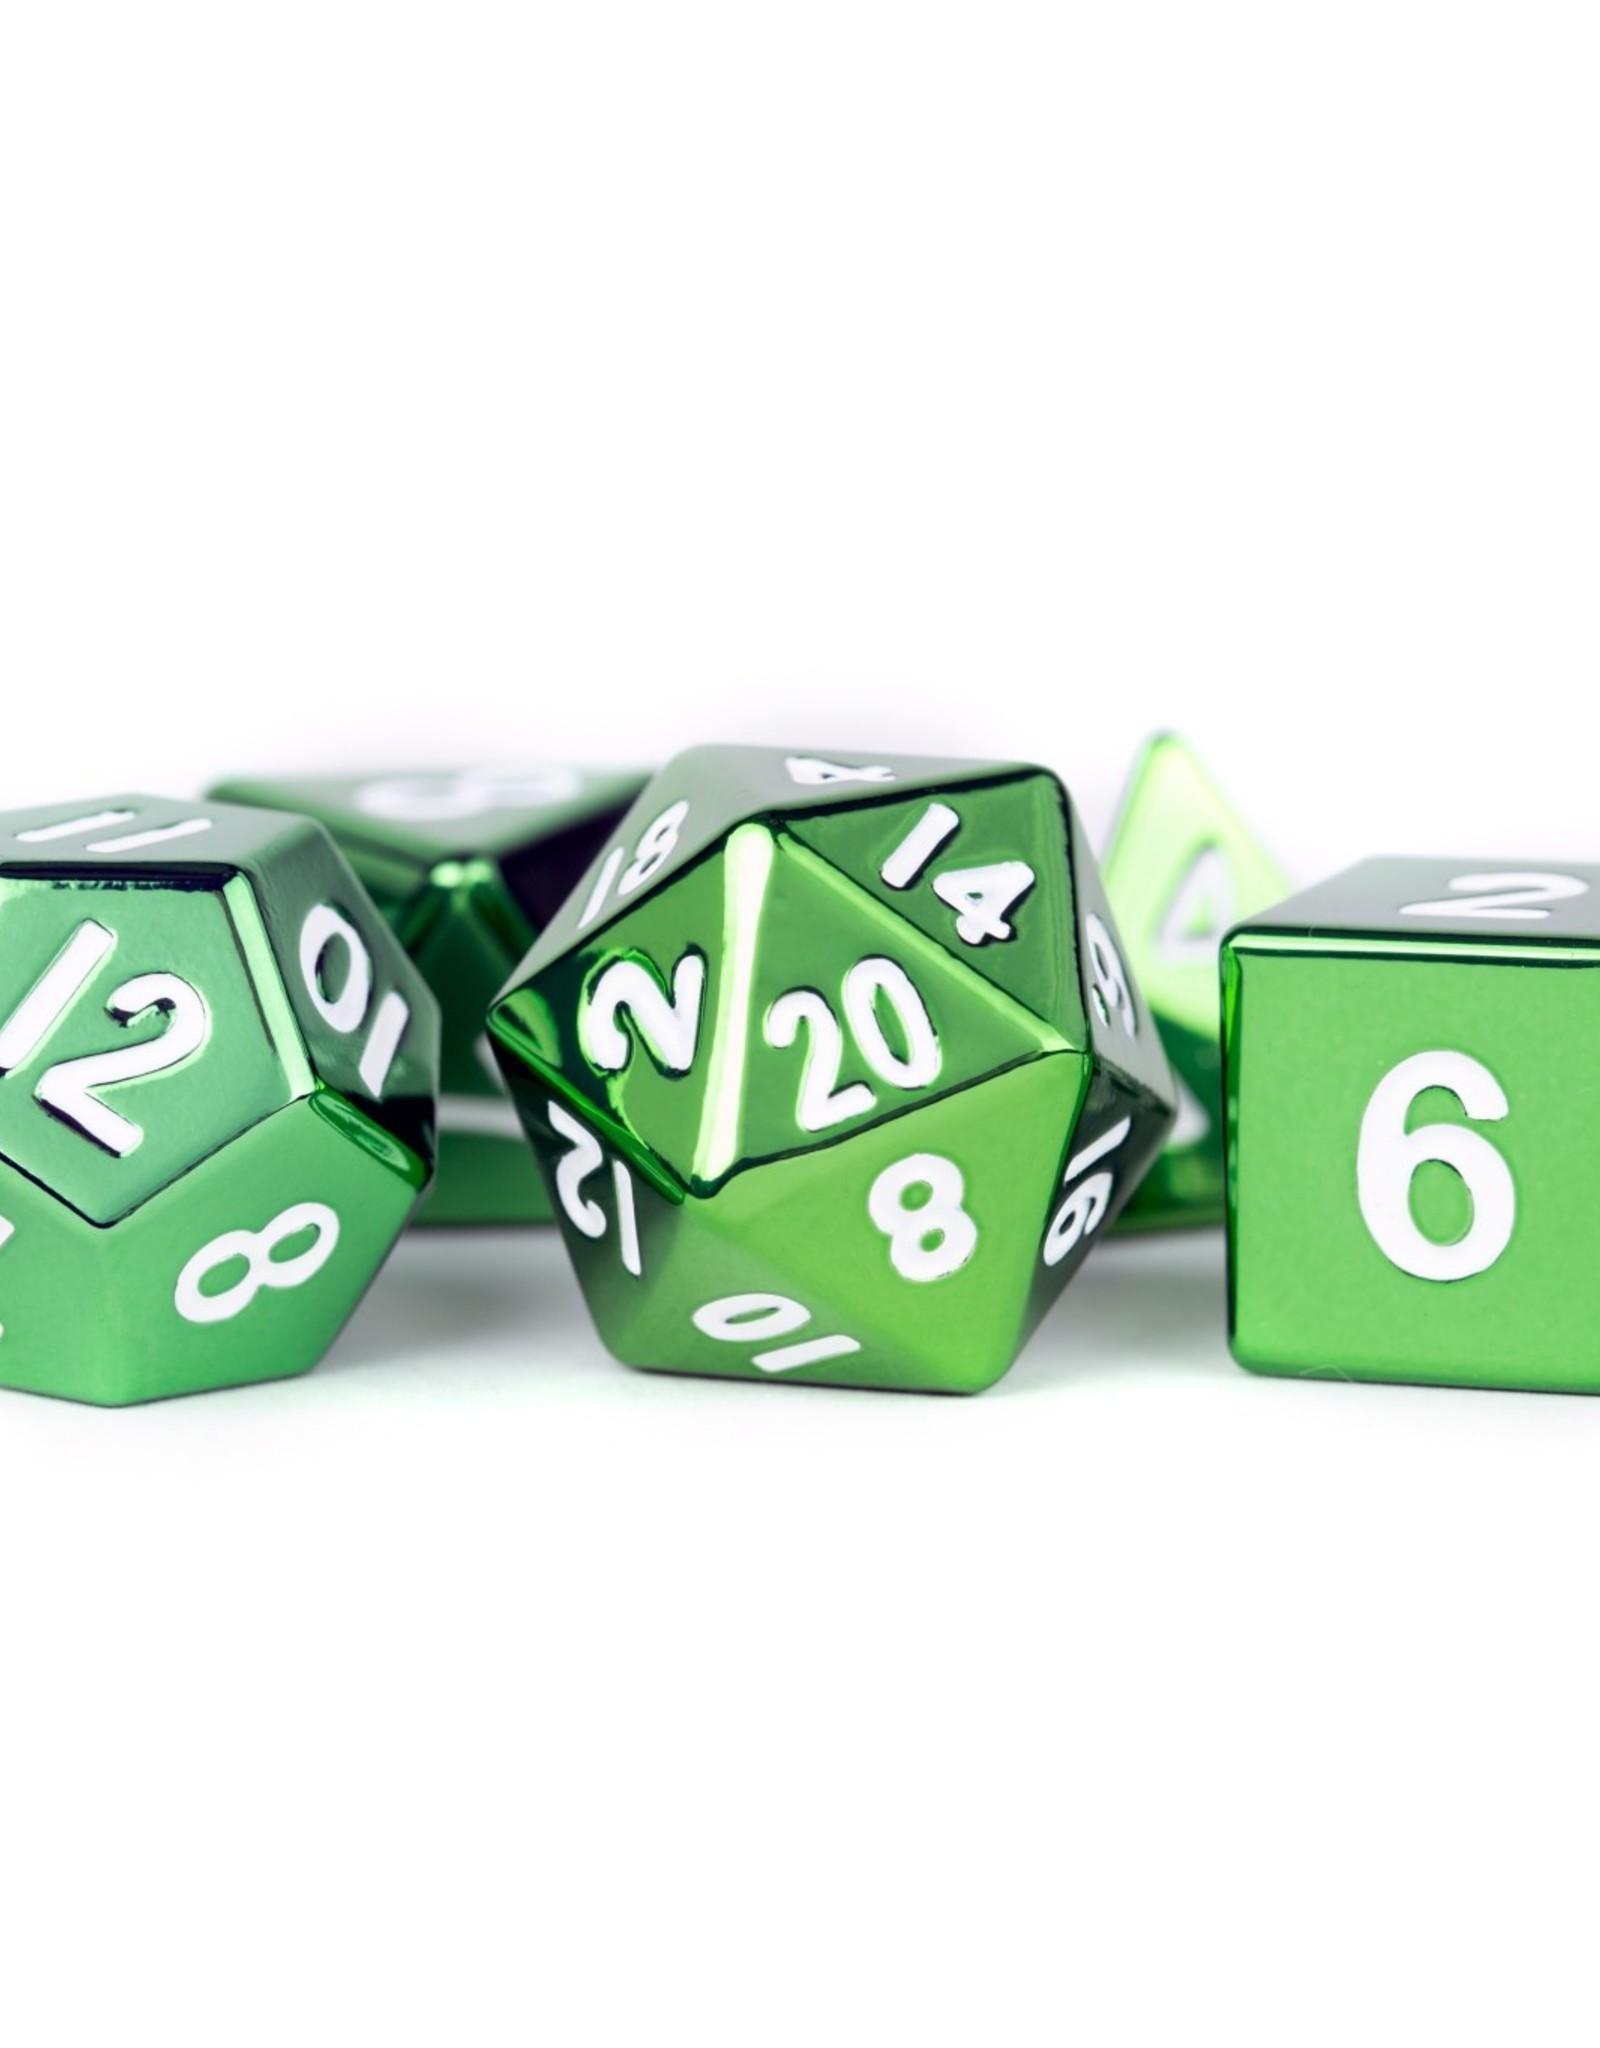 Metallic Dice Games Metal Dice Set Green